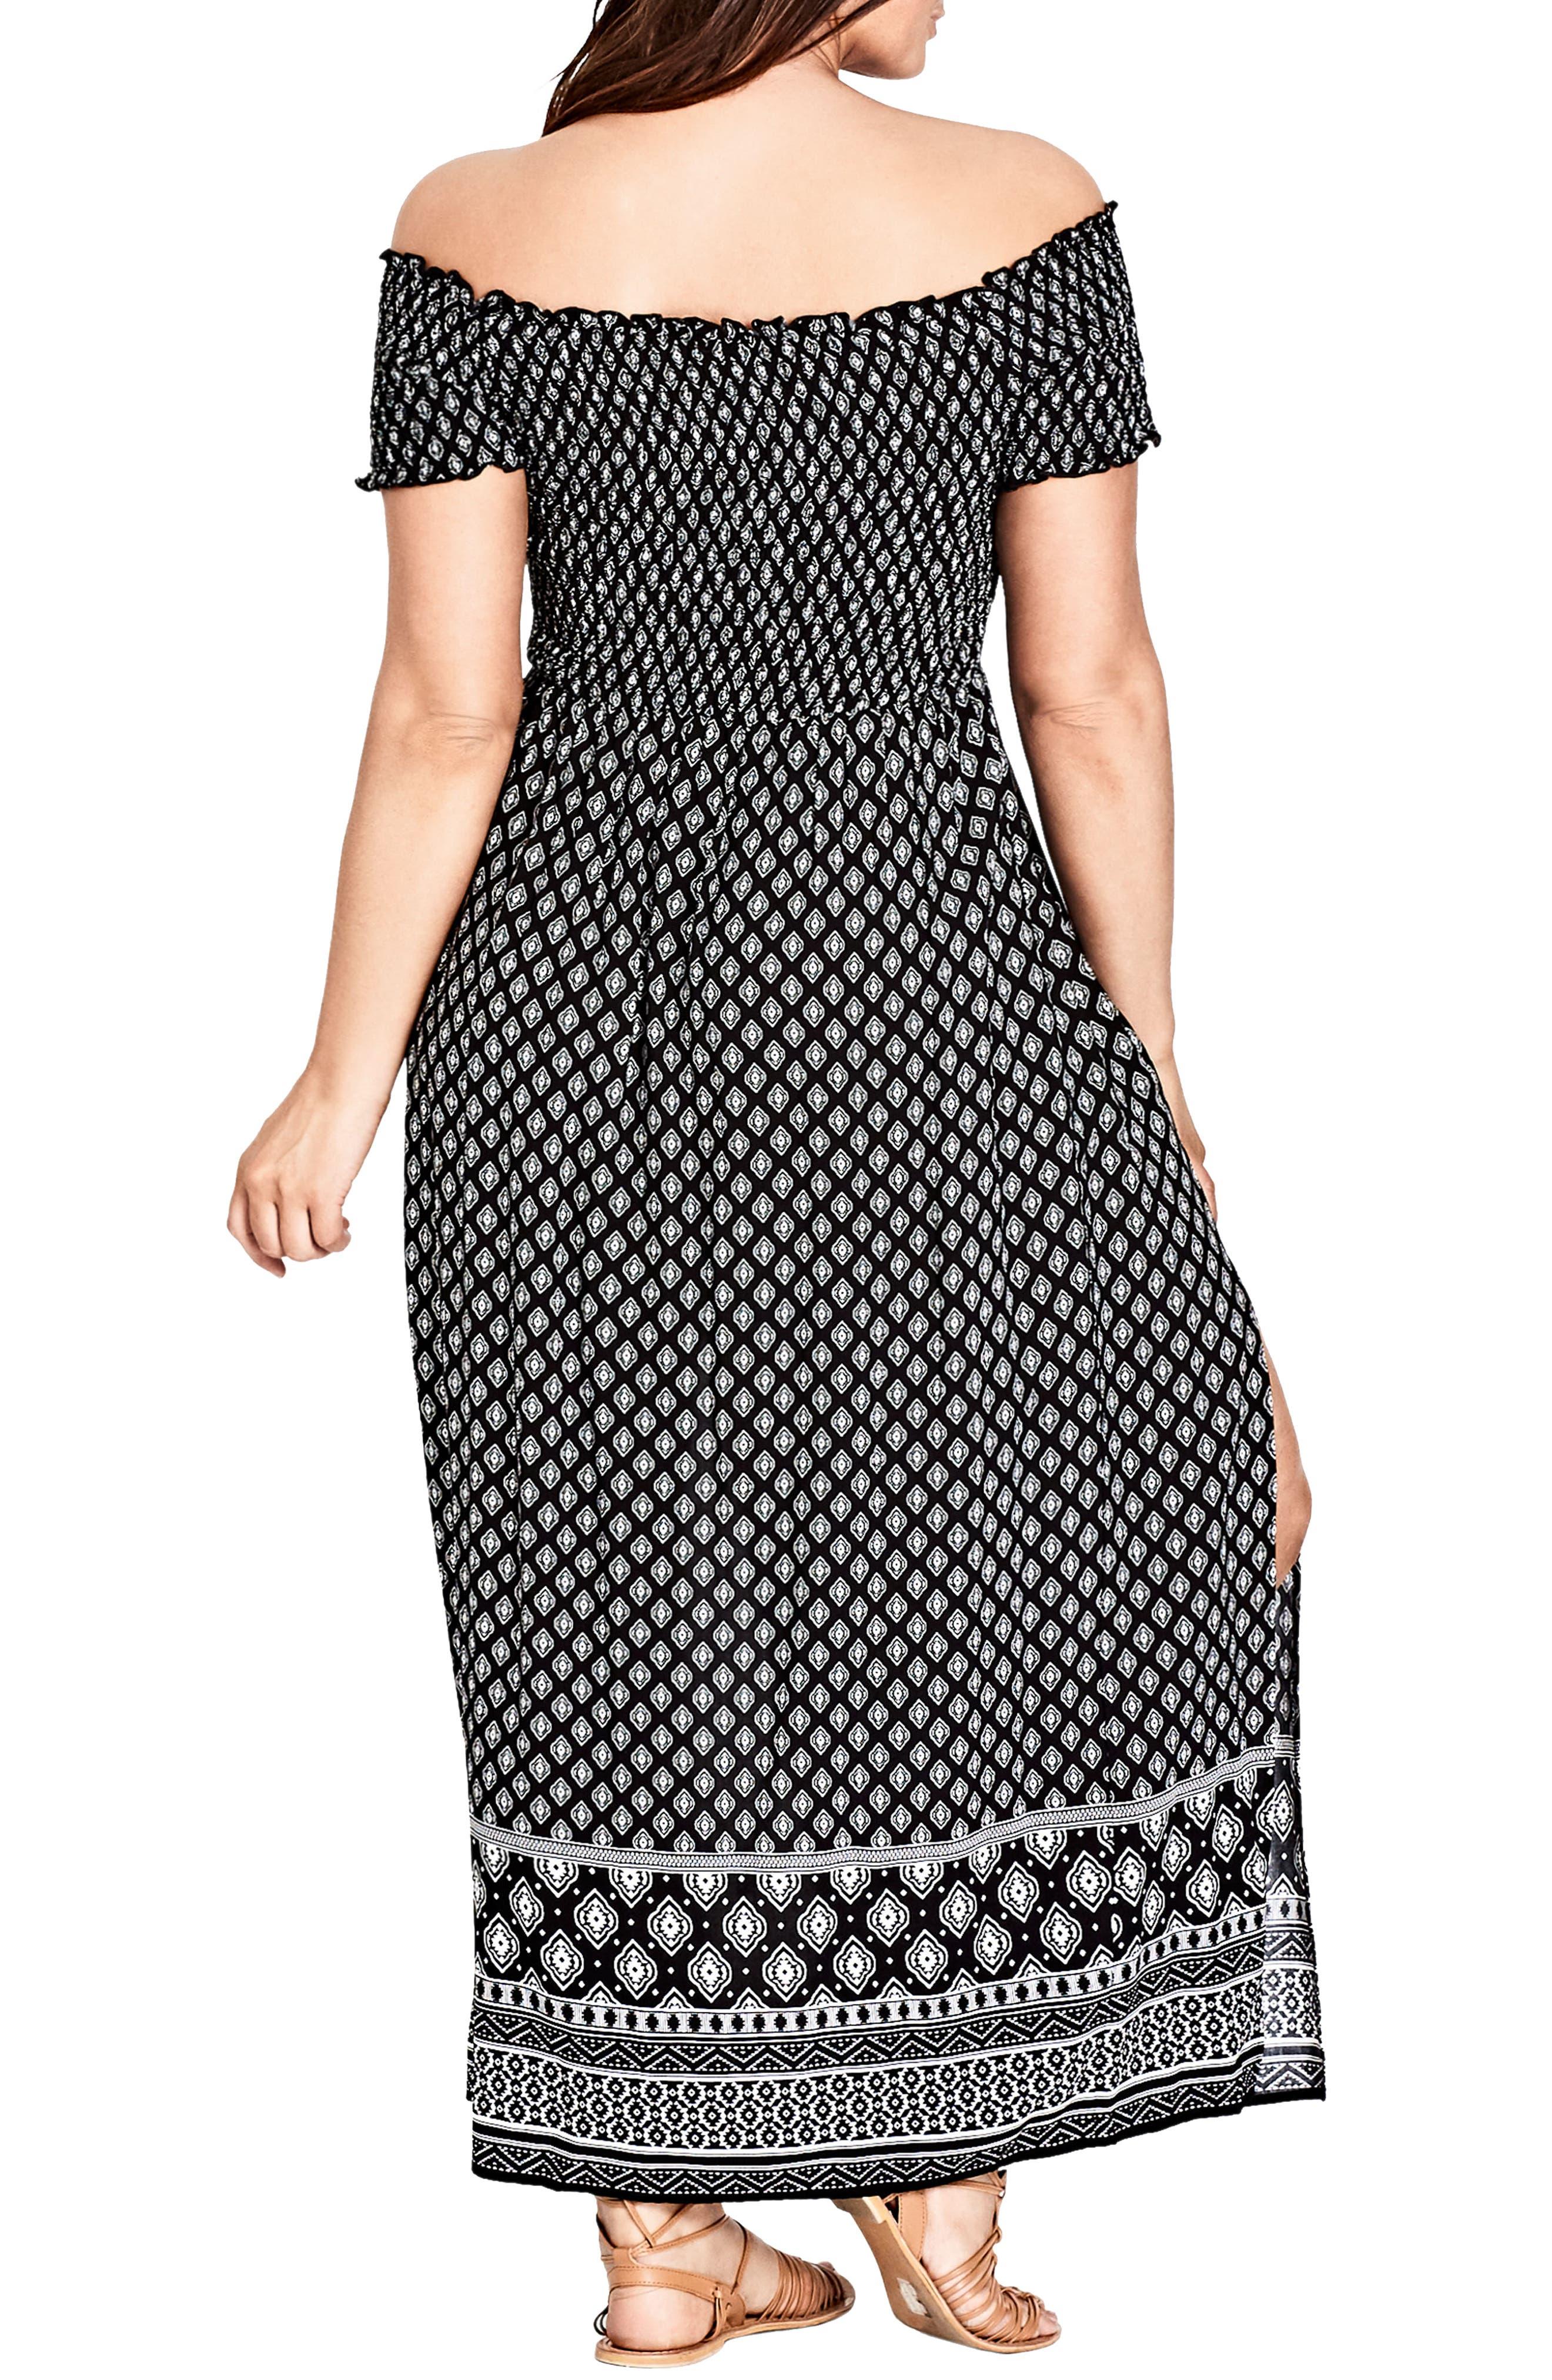 Smocked Off the Shoulder Maxi Dress,                             Alternate thumbnail 2, color,                             BLACK PRINT